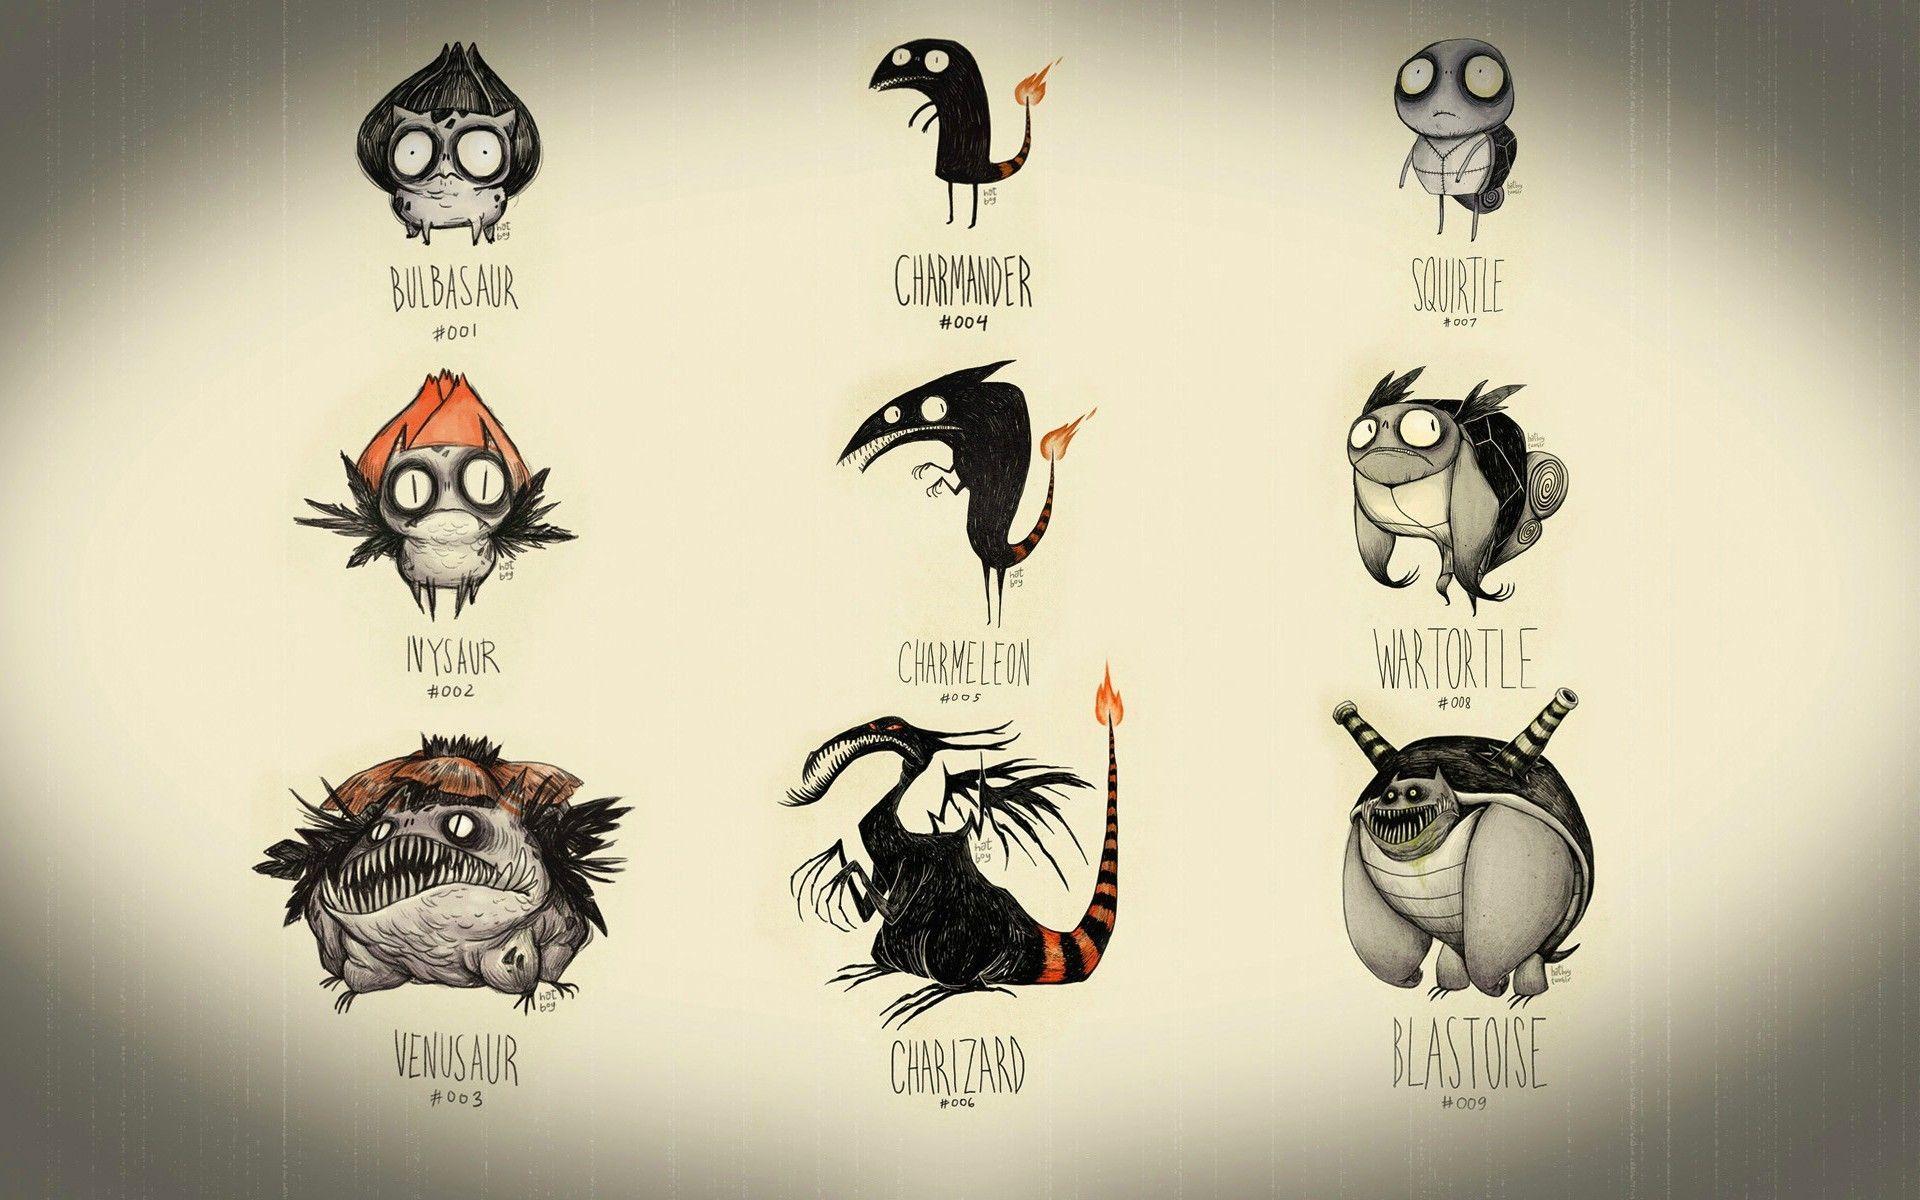 Pokemon Charizard Wallpapers - Full HD wallpaper search